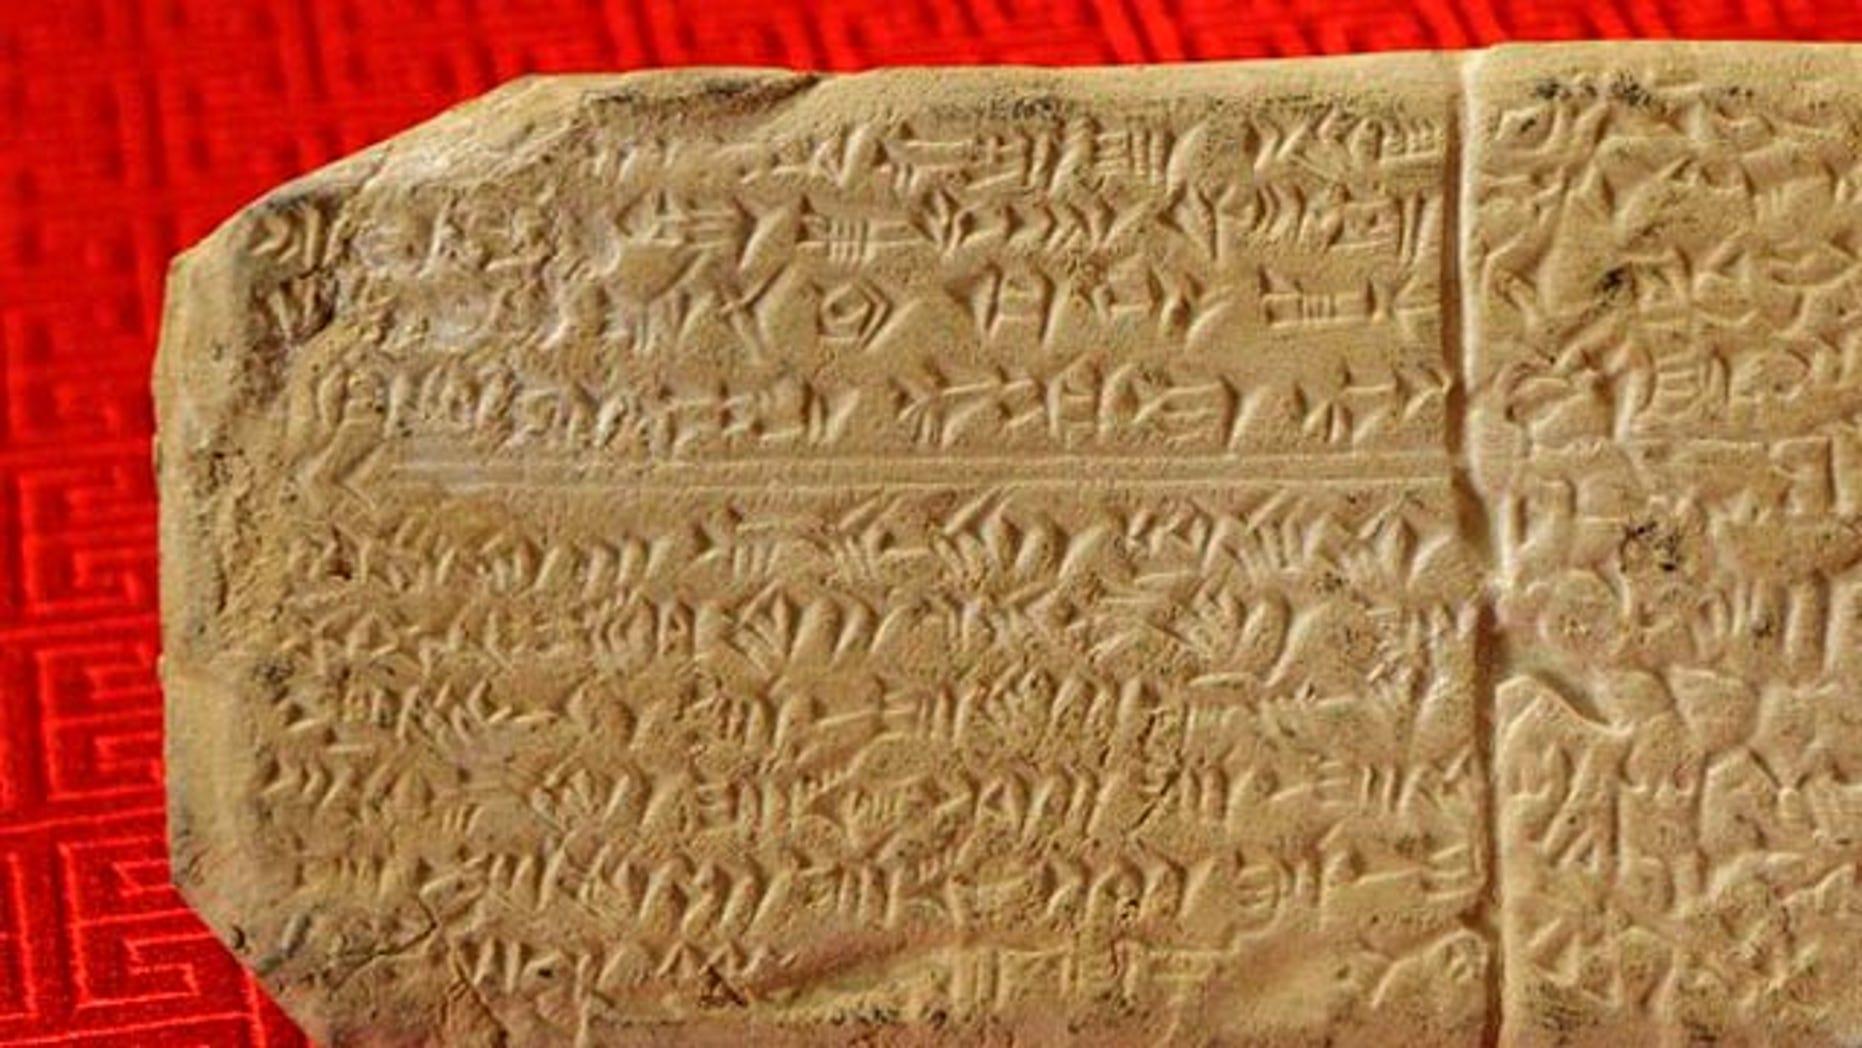 A sample of Ugaritic script on a gift-shop replica.